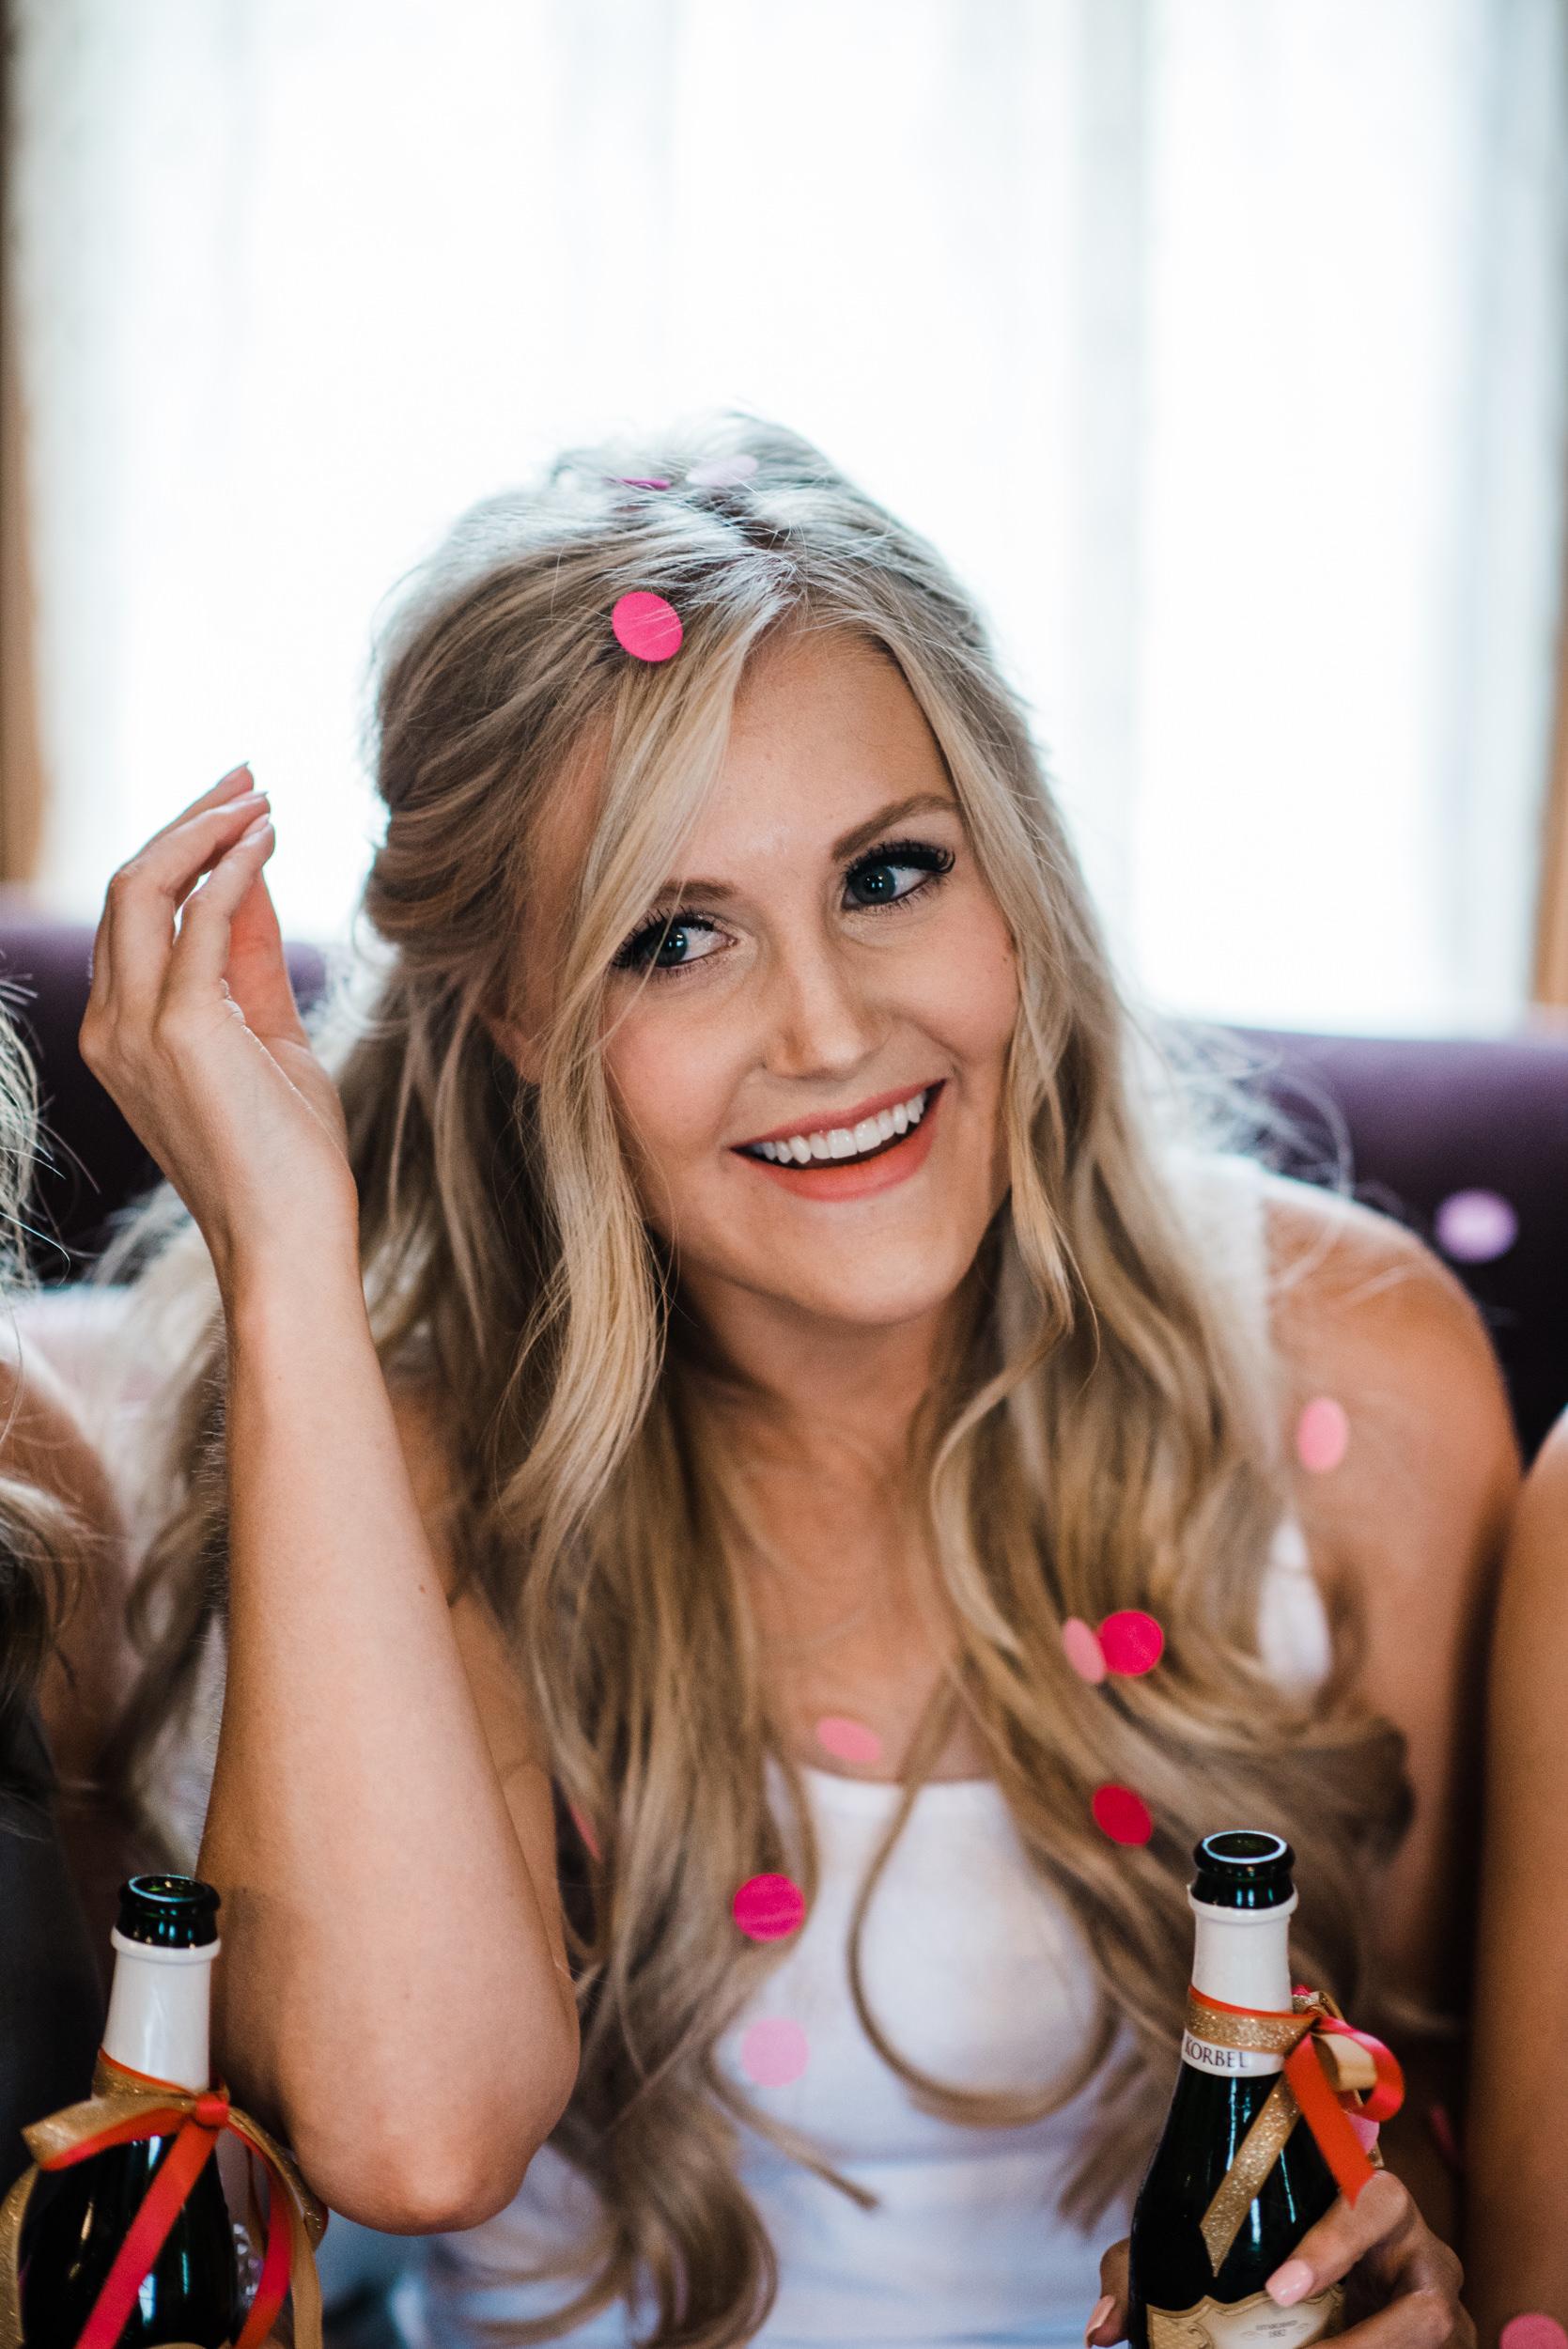 Colorado mountain wedding photographer at Brookeside Gardens bride with confetti in her hair